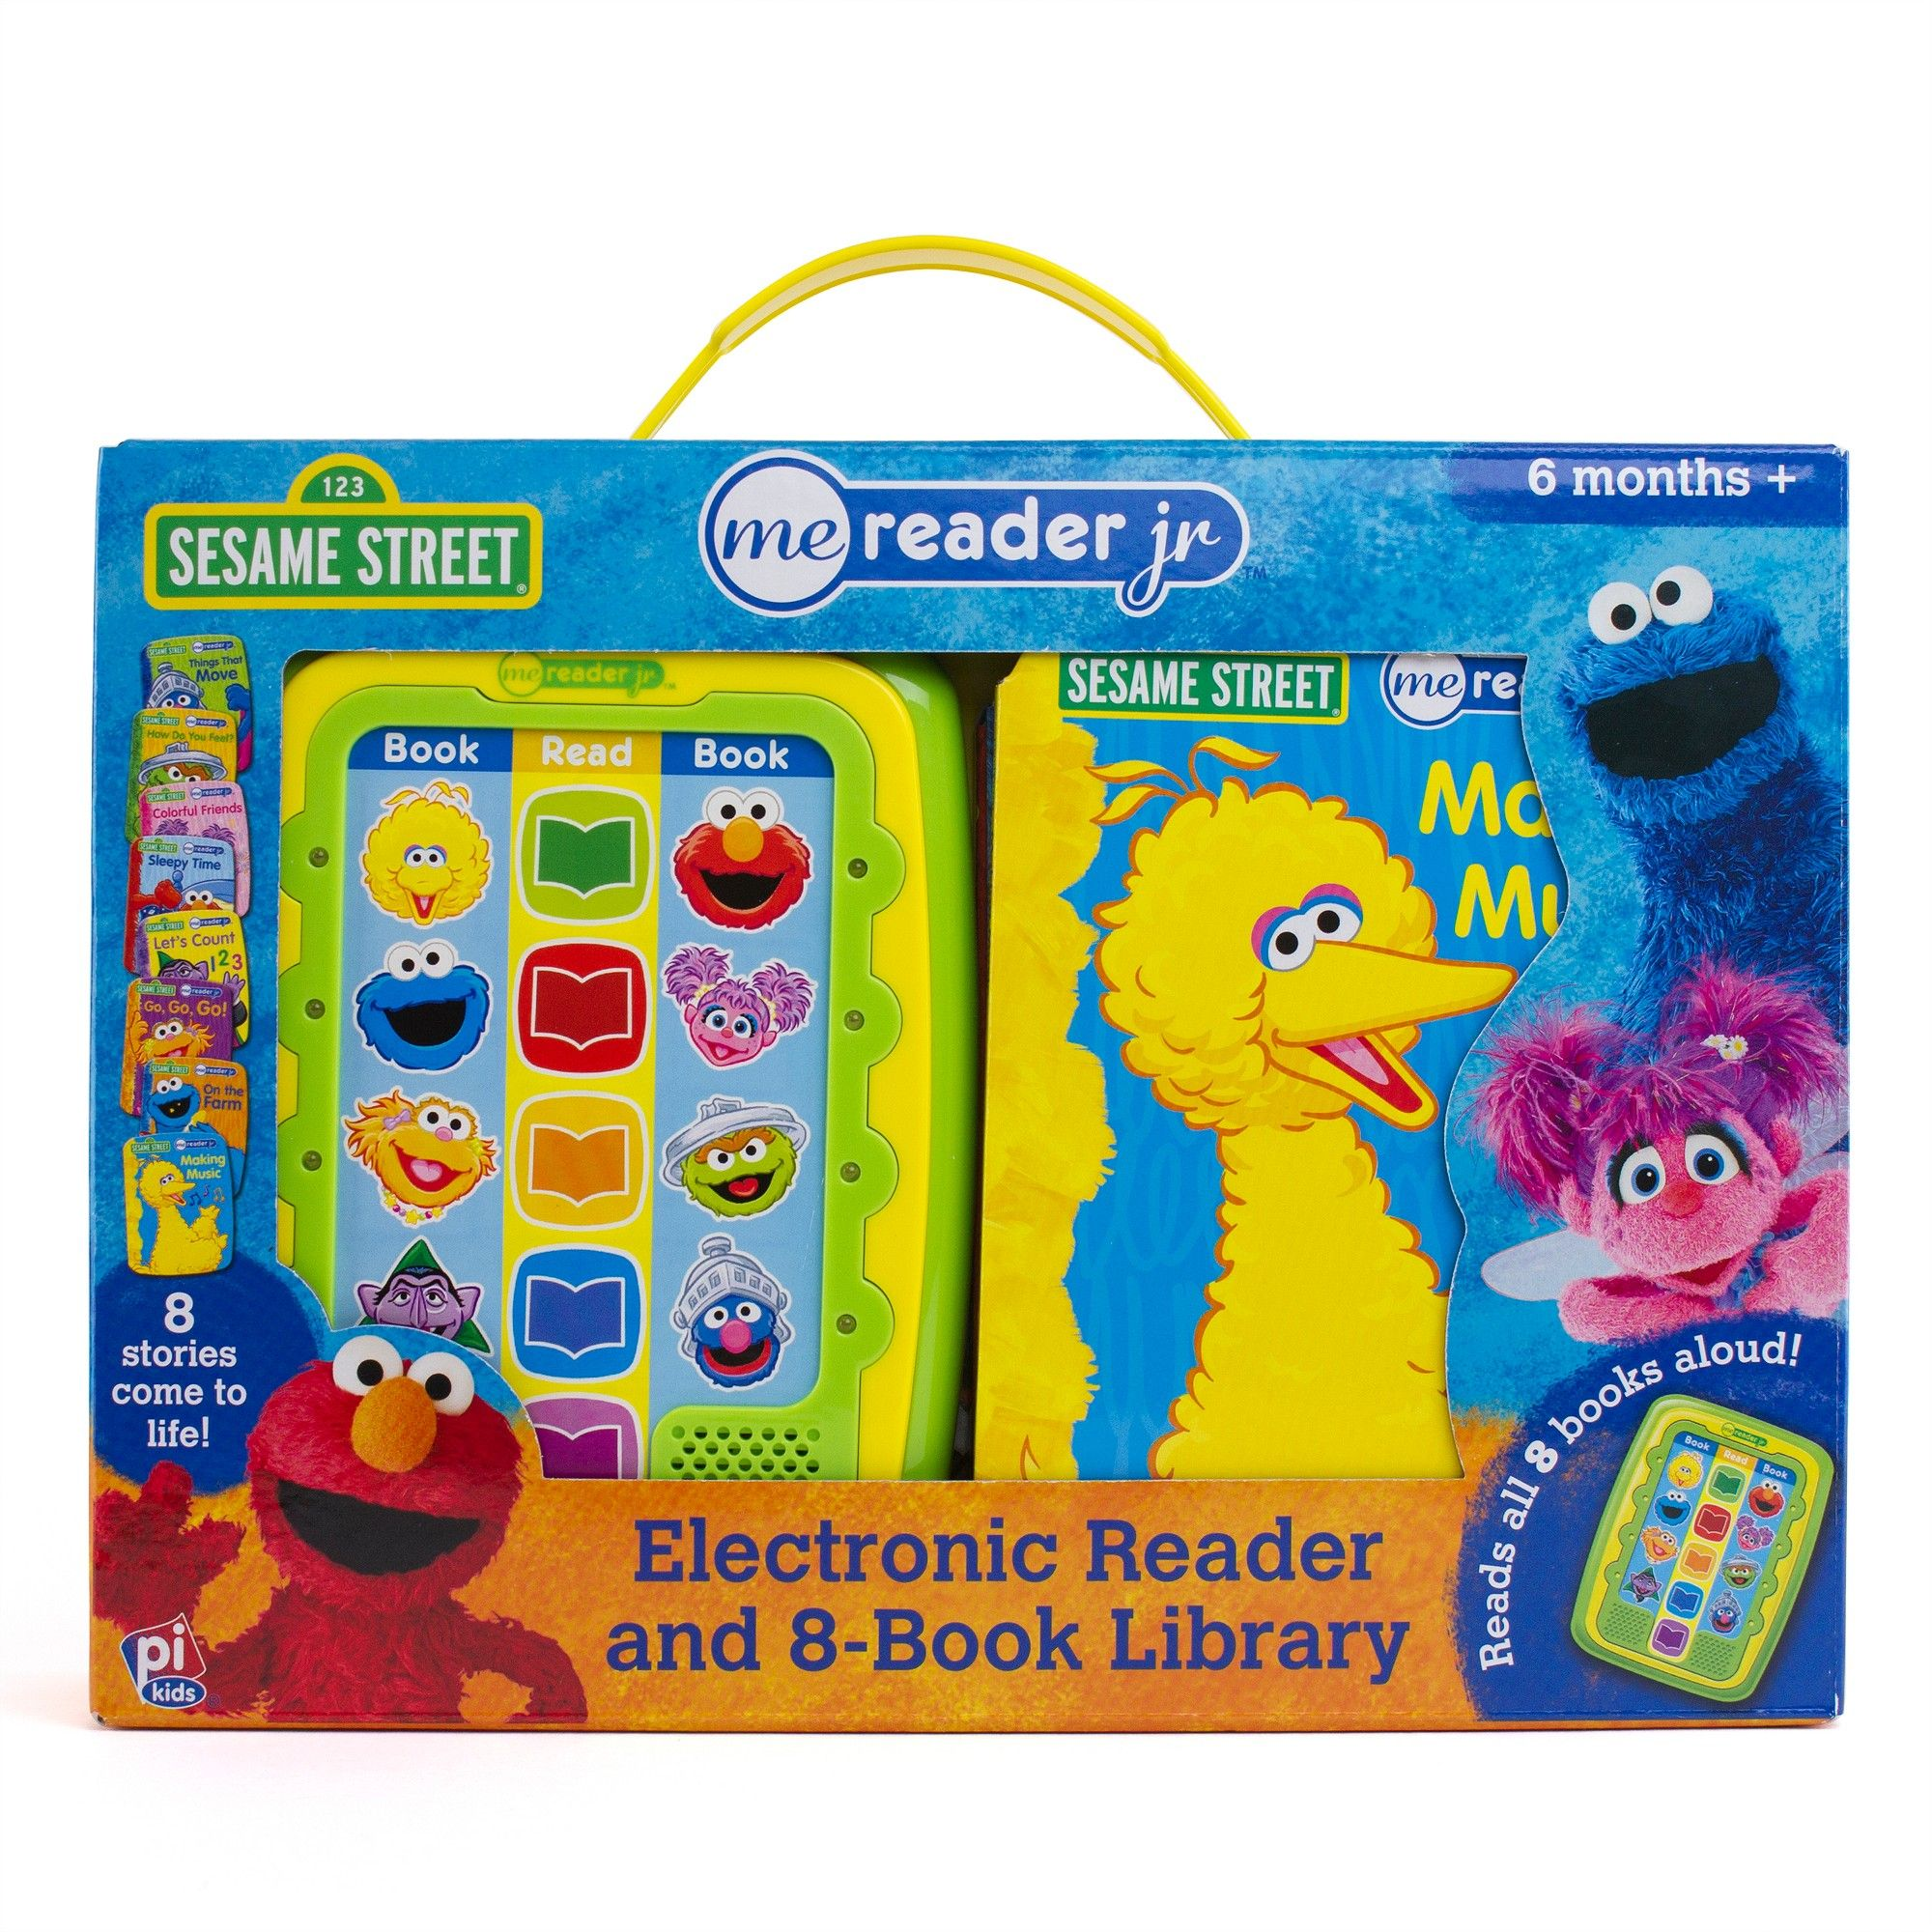 Sesame Street Electronic Me Reader Jr Story Reader And 8